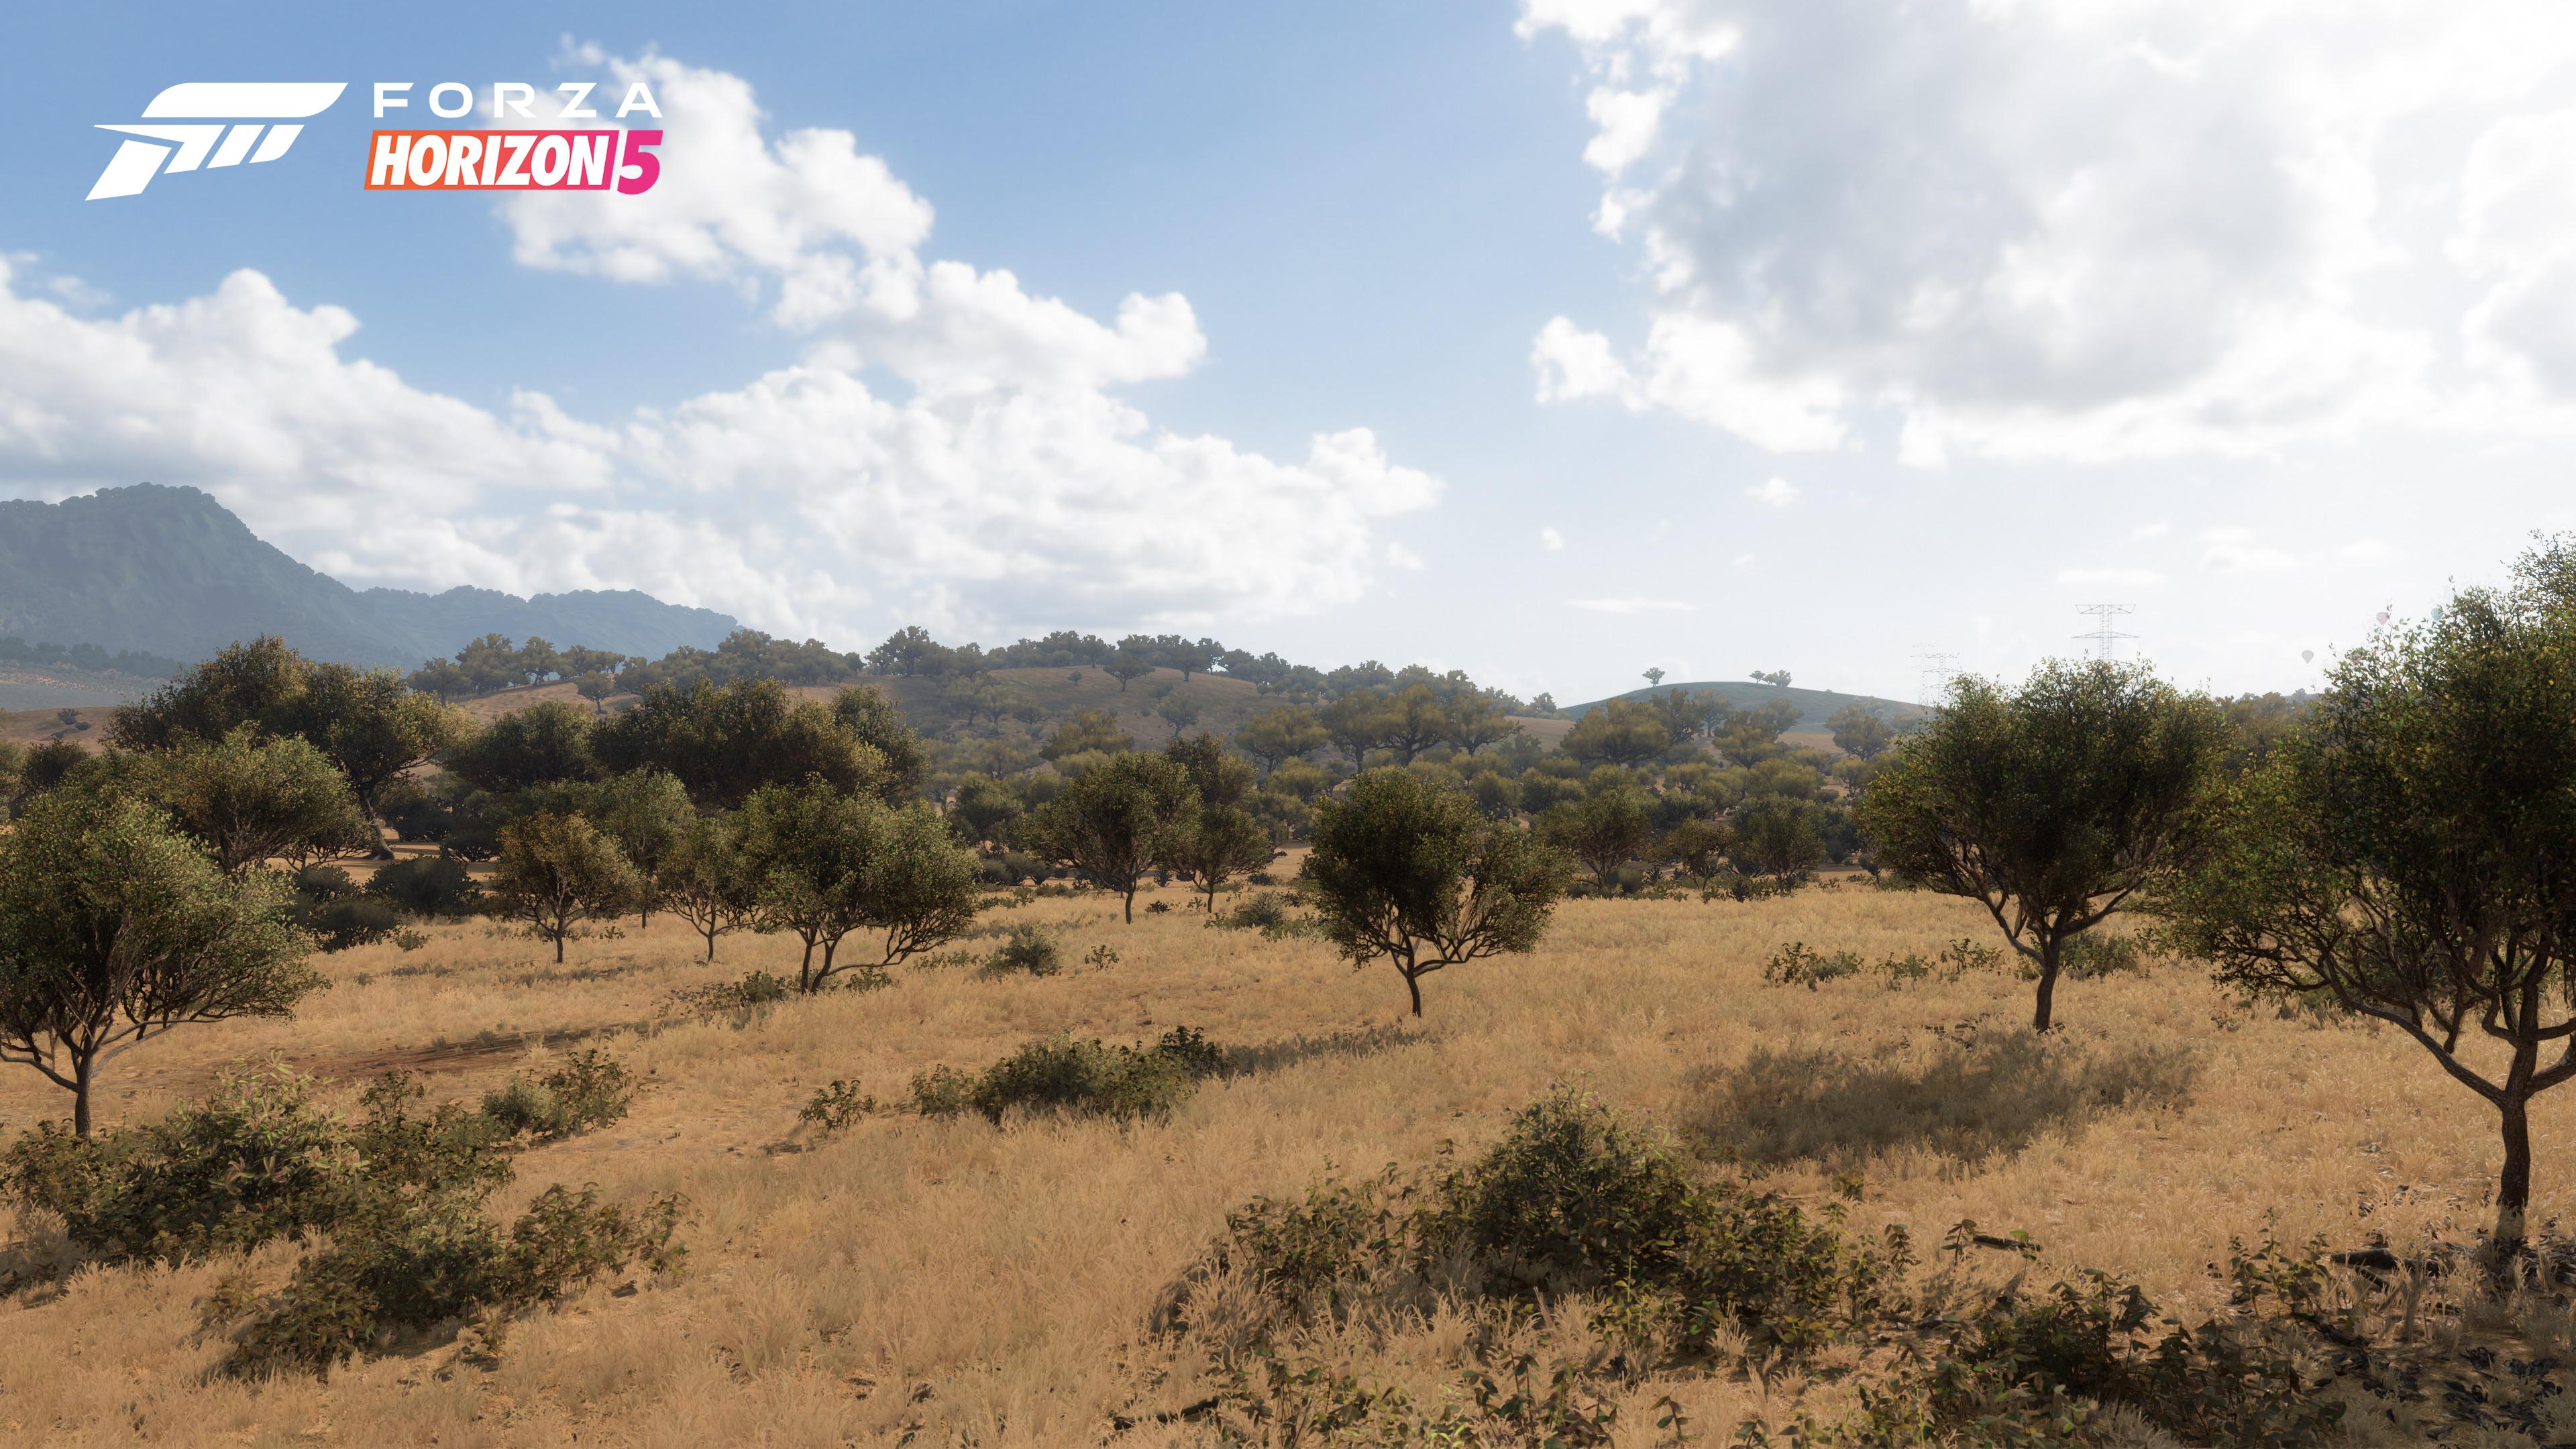 Forza Horizon 5 Biomes and Season